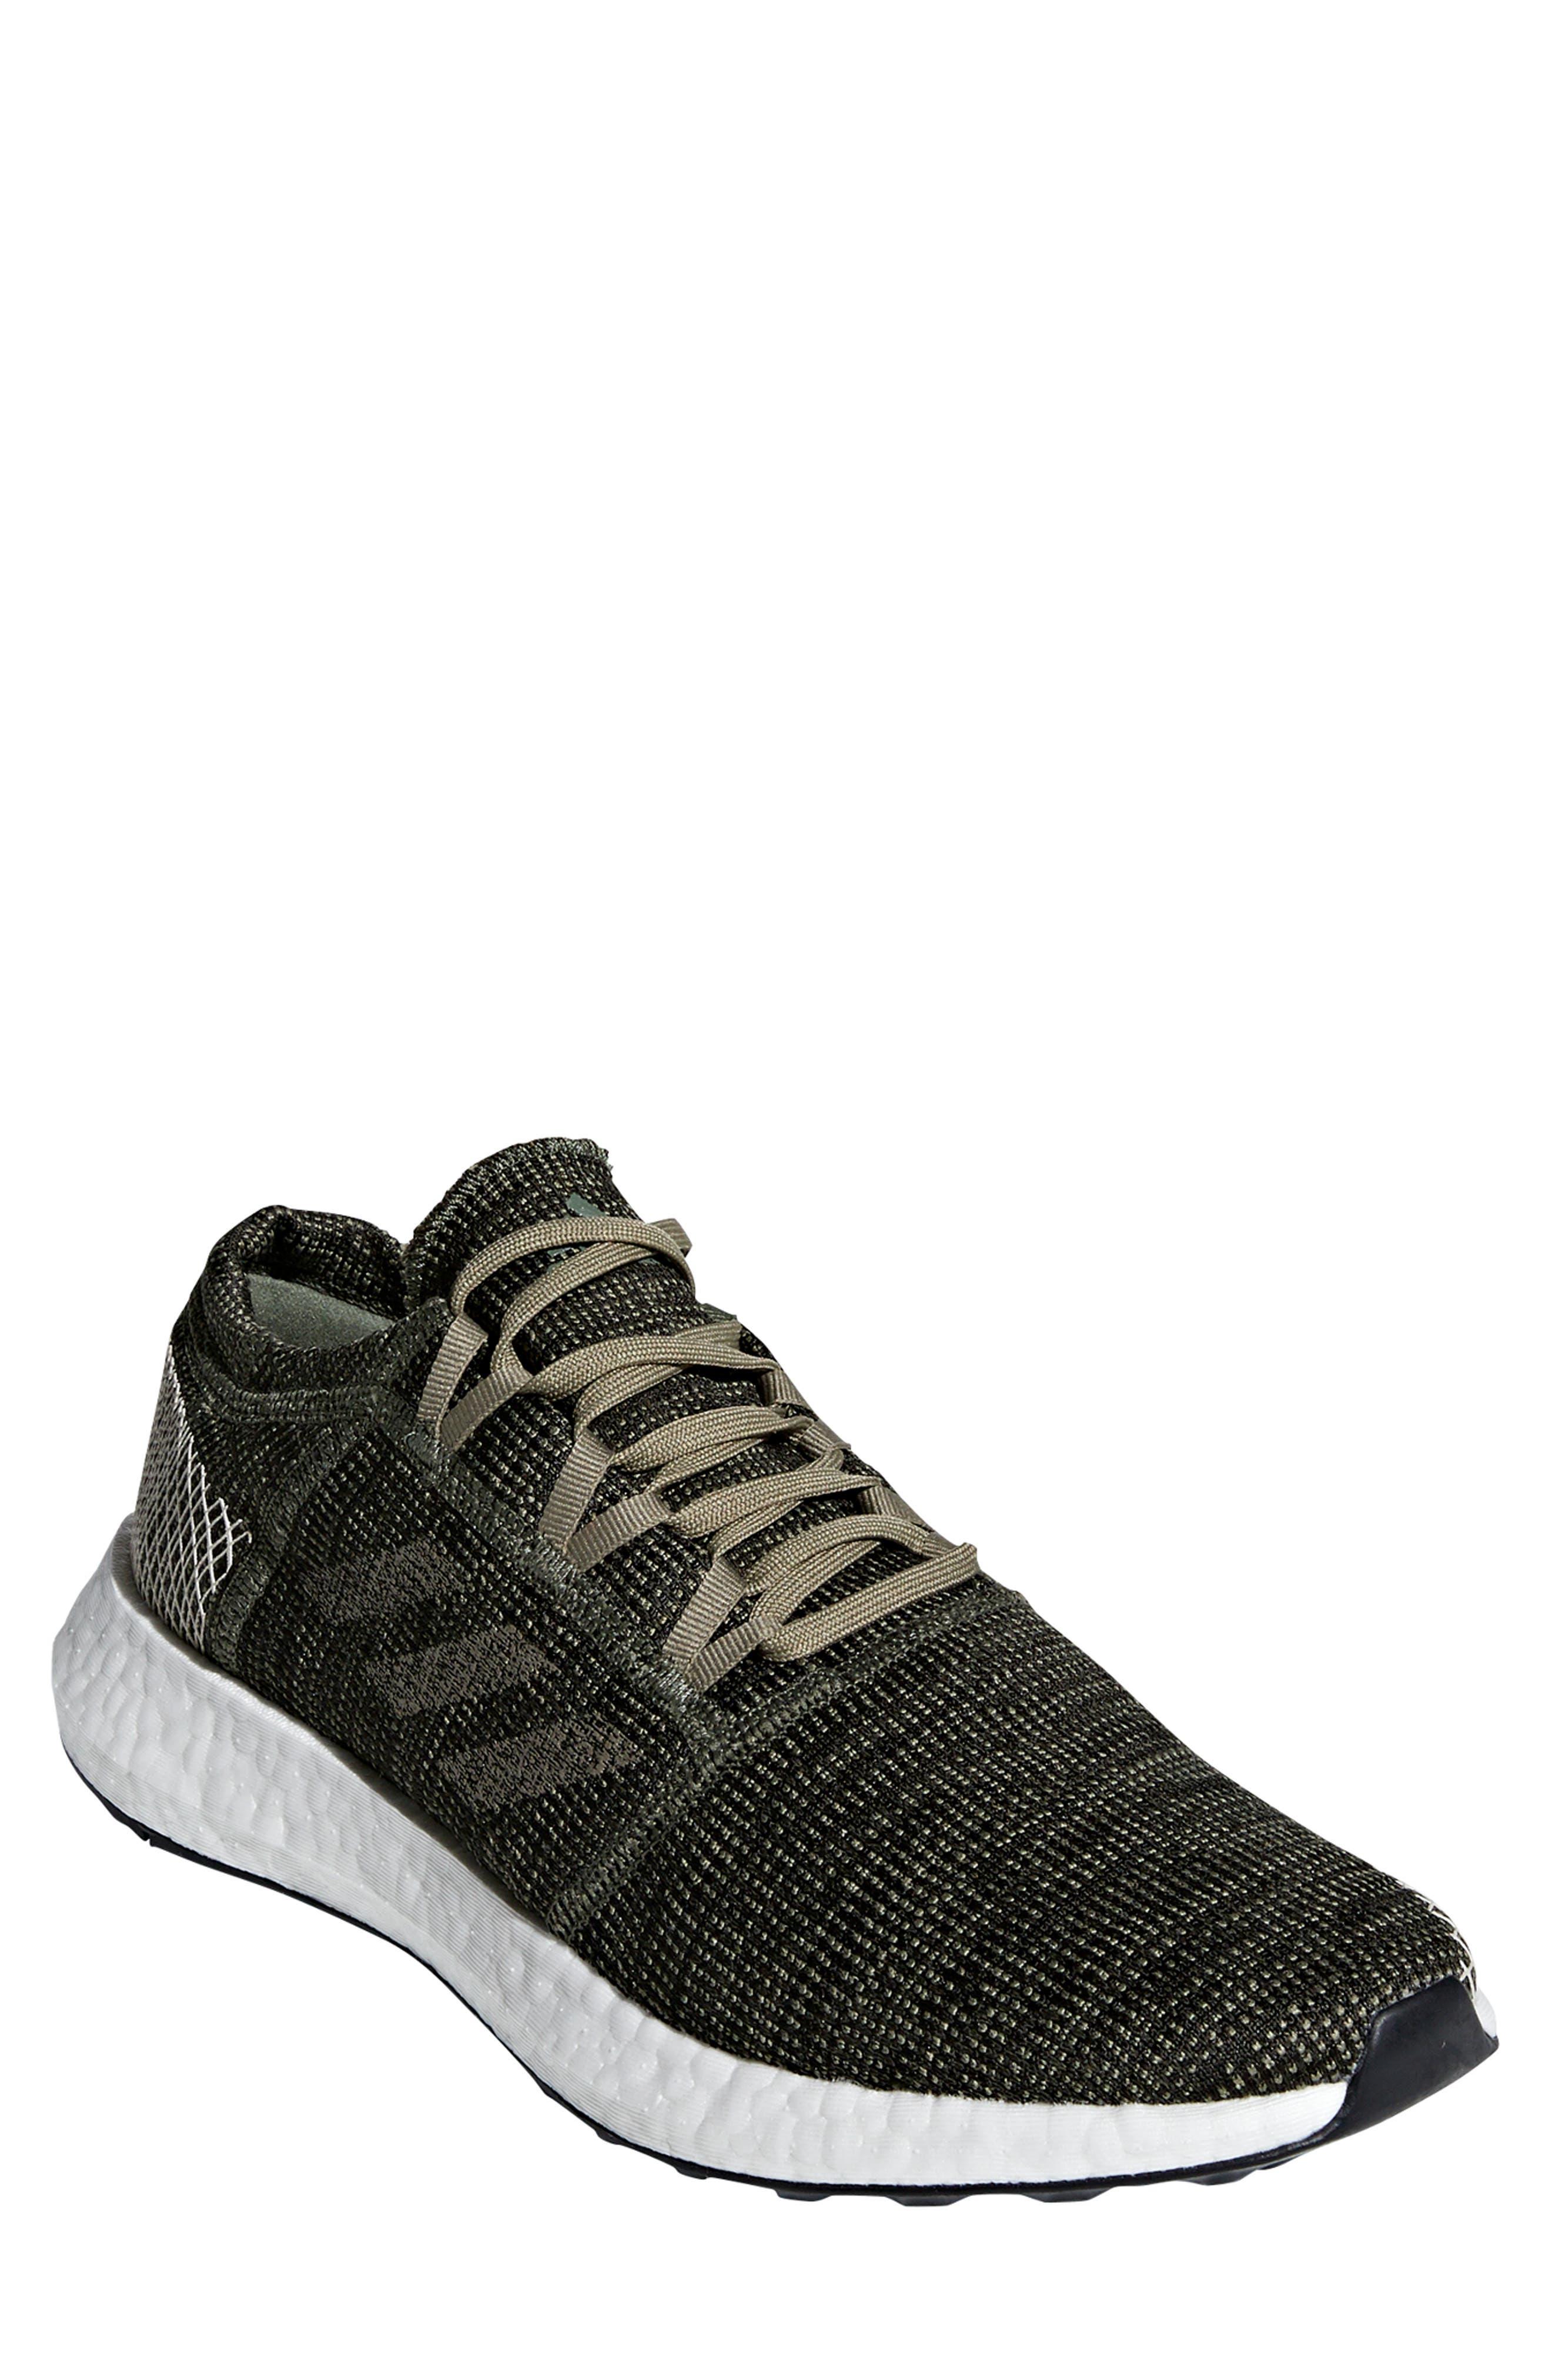 PureBoost GO Running Shoe,                         Main,                         color, 300